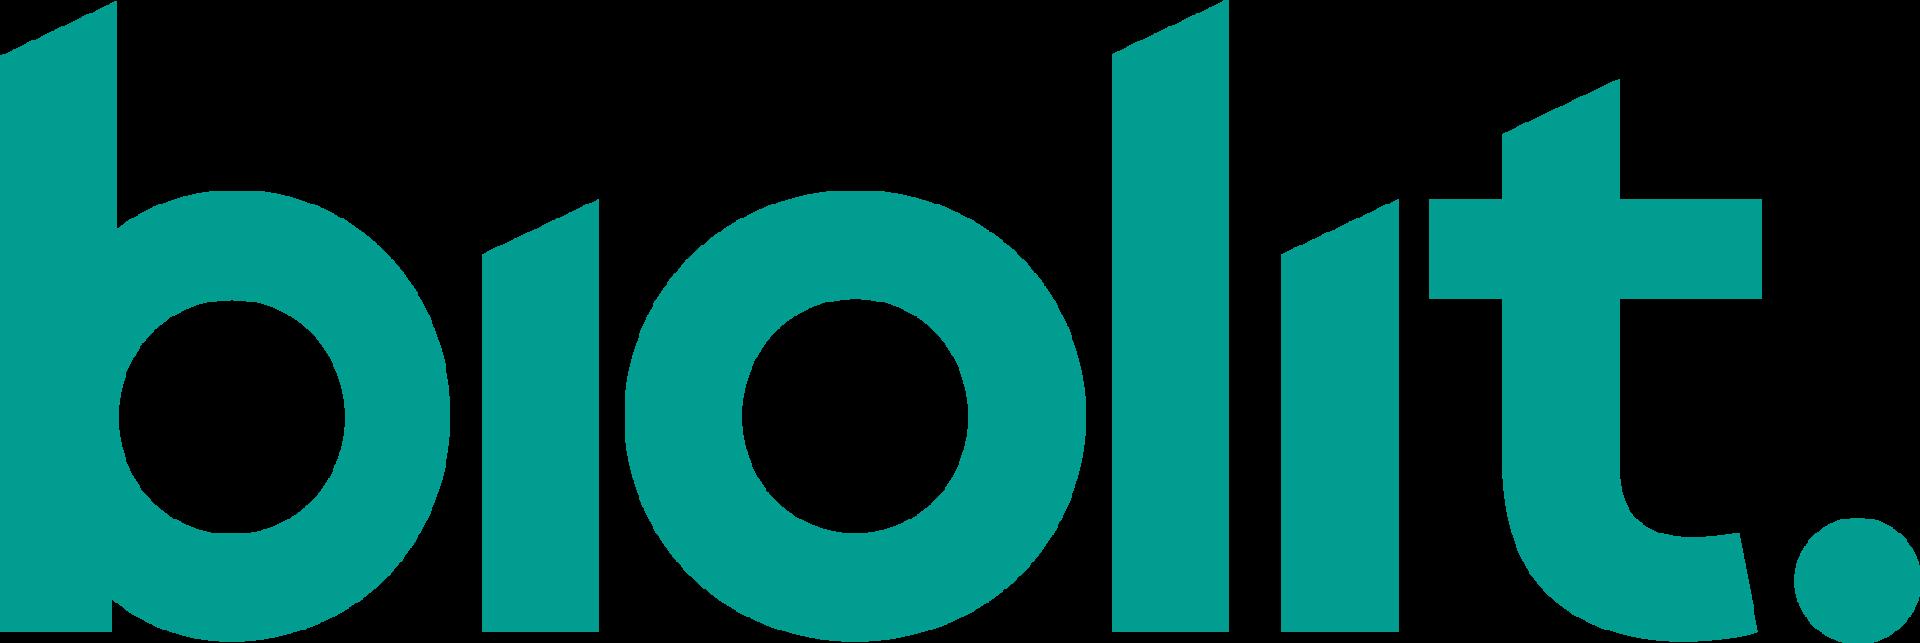 Biolit logo